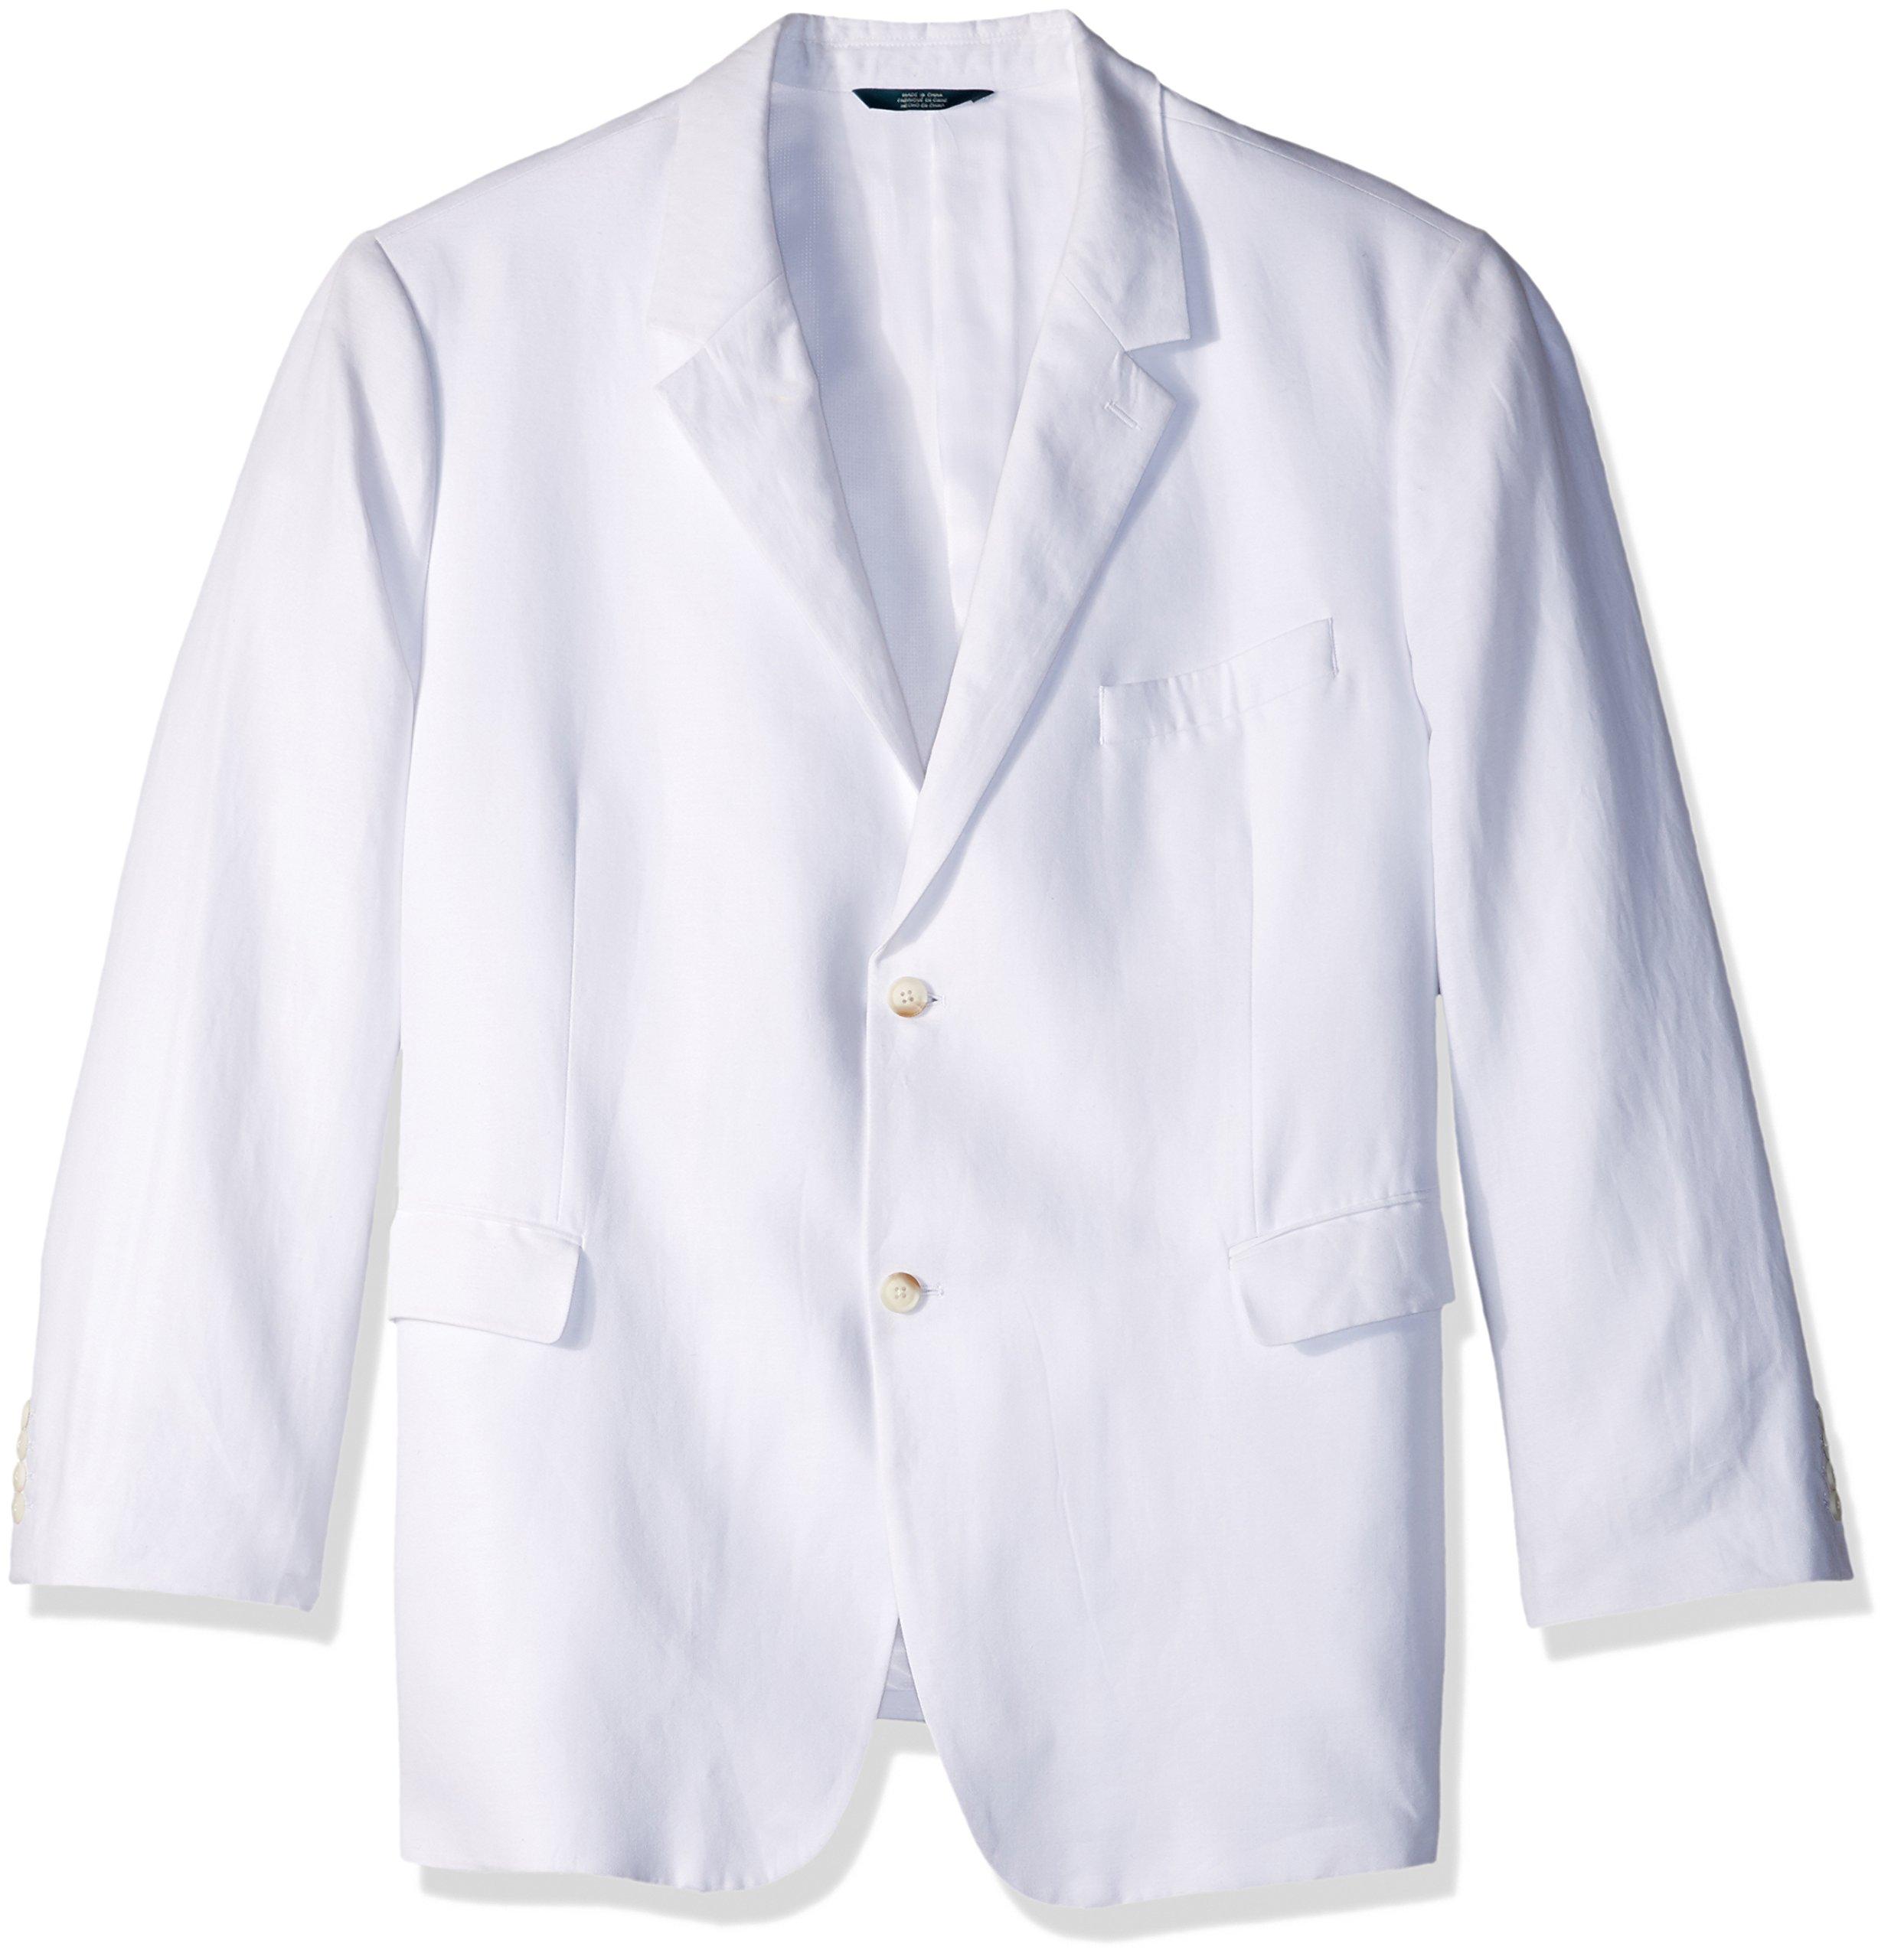 Perry Ellis Men's Tall Linen Suit Jacket, Bright White, 54 Big